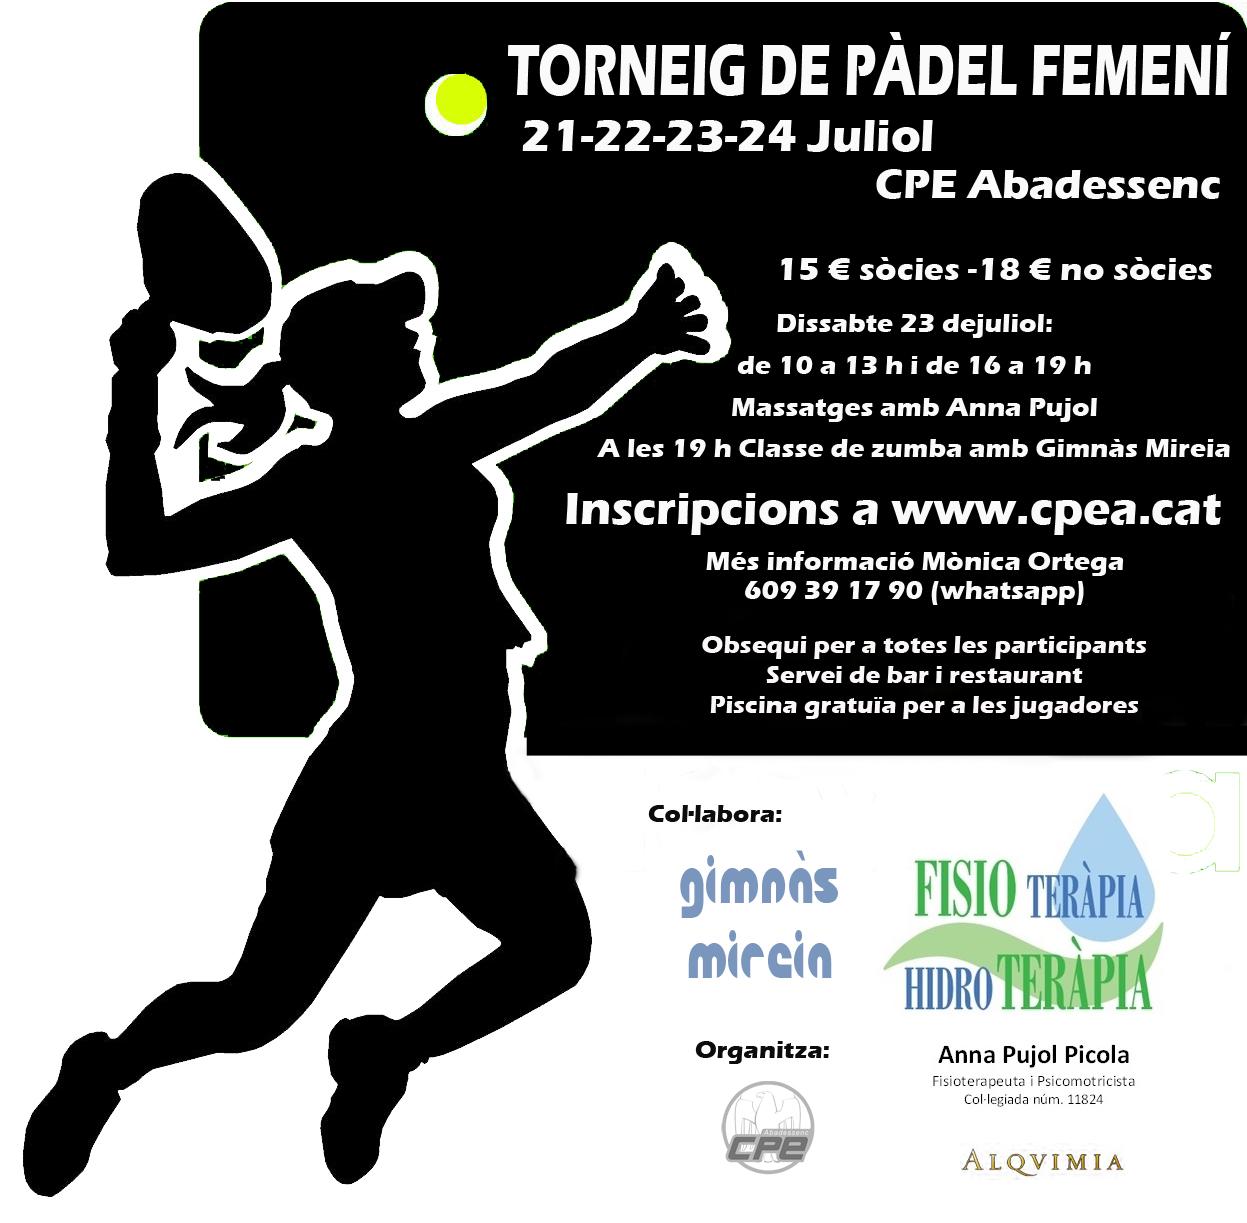 5i7q_torneig femeni copy.jpg